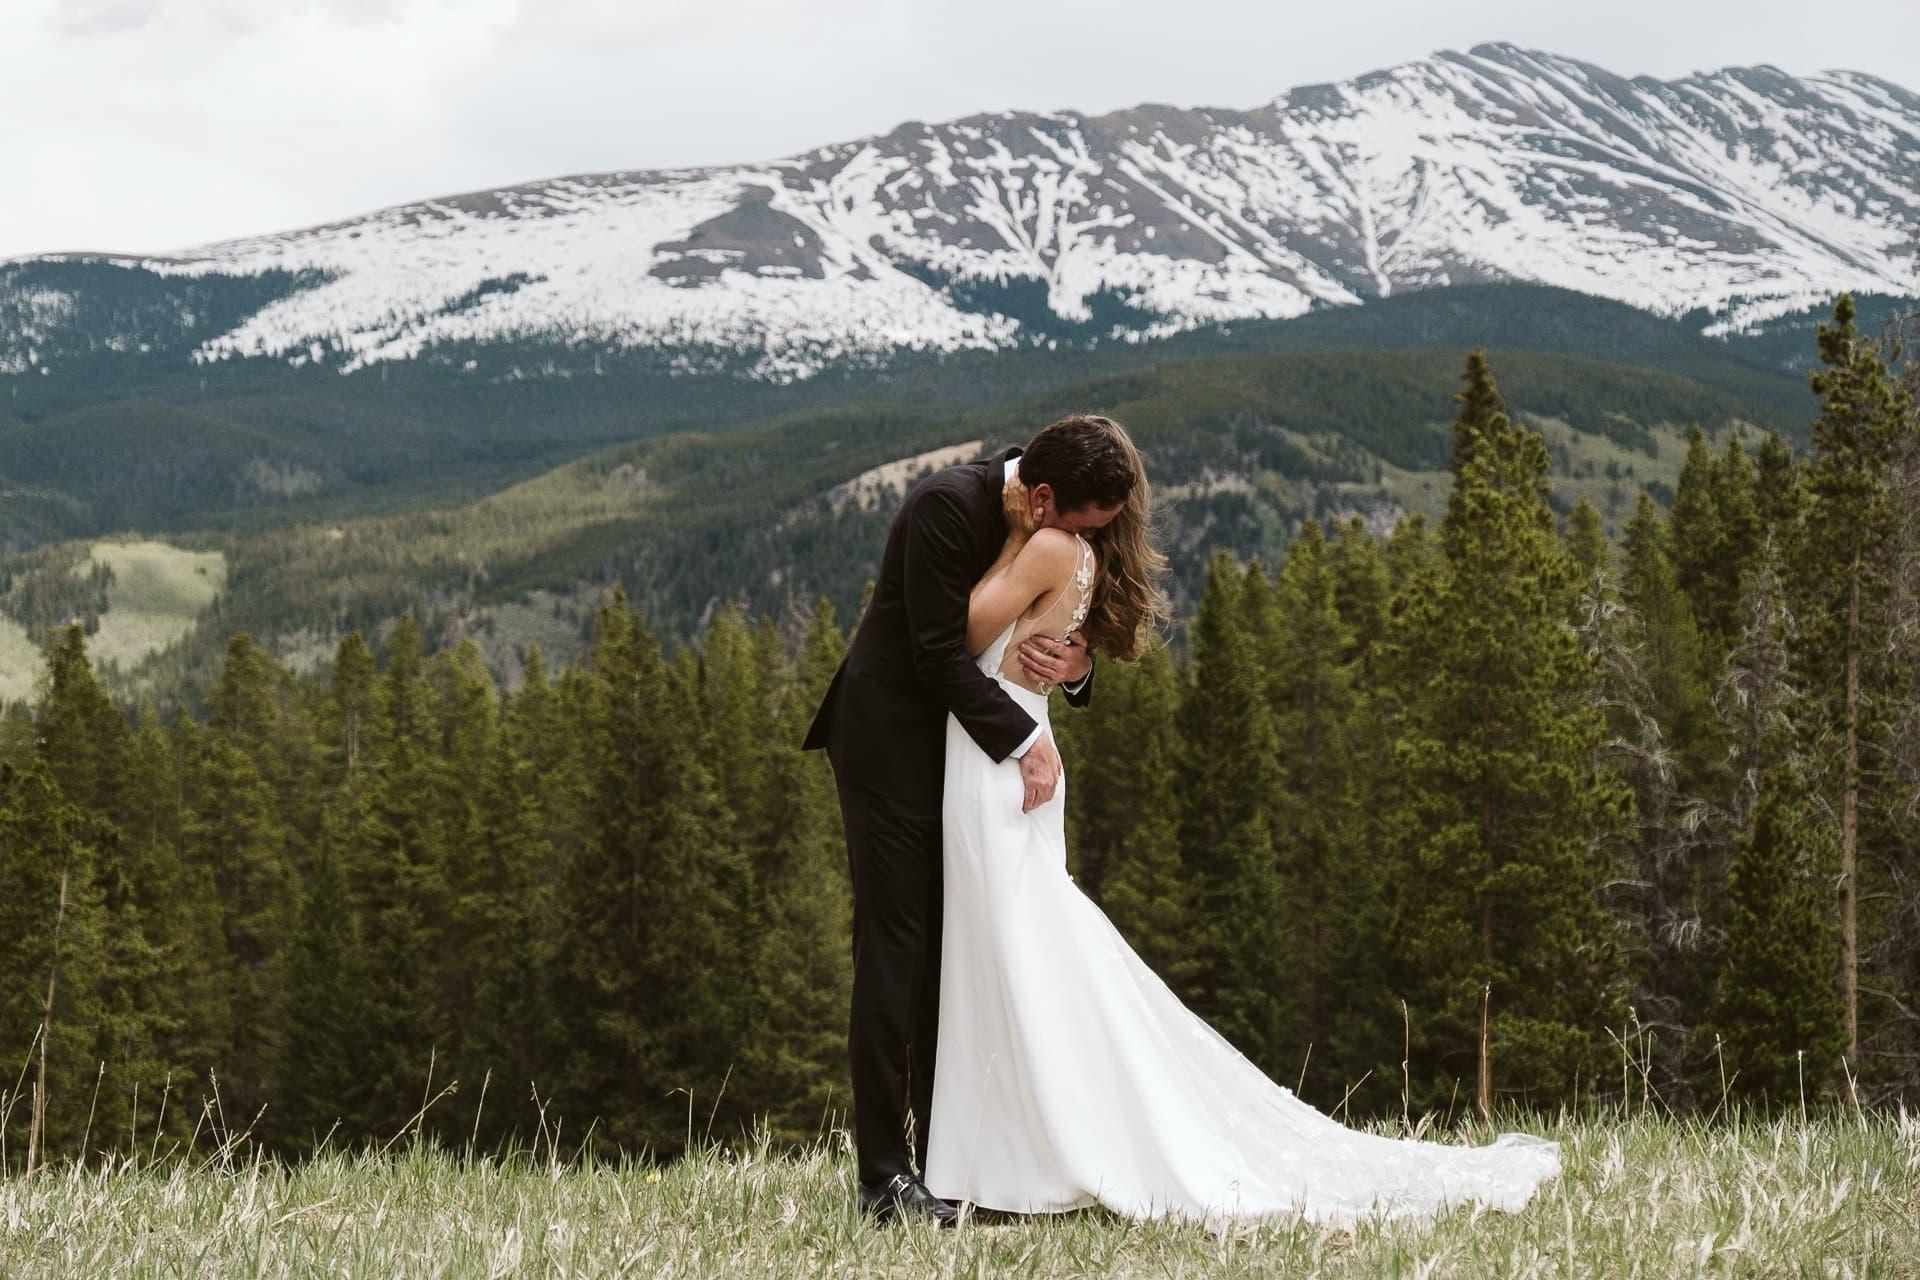 Bride and groom portraits at Ten Mile Station, Breckenridge ski resort wedding, Colorado mountain wedding photographer